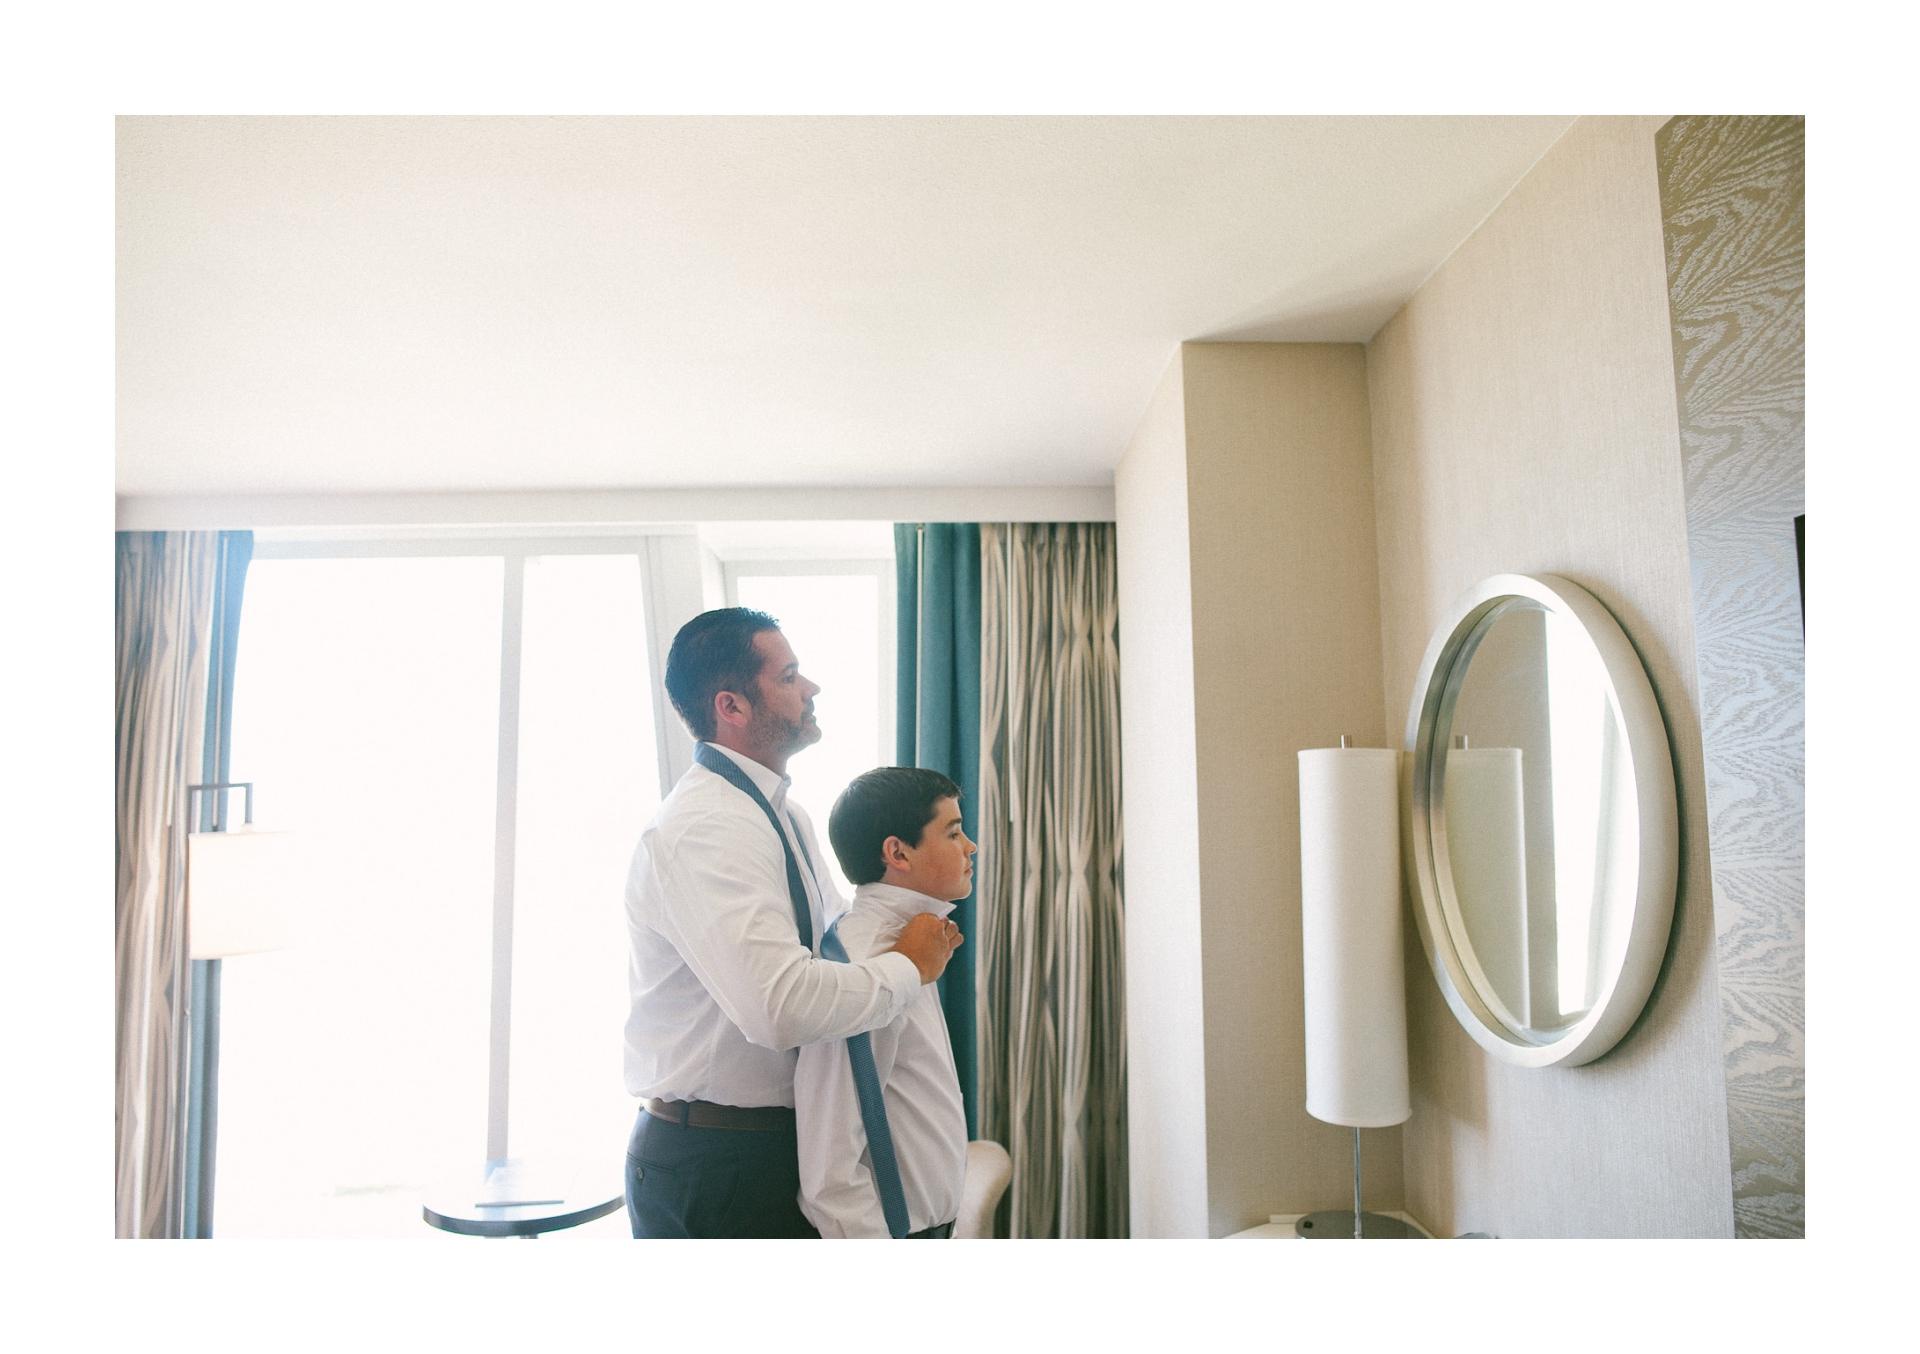 Nuevo Modern Mexican Wedding Photographer in Cleveland 1 6.jpg